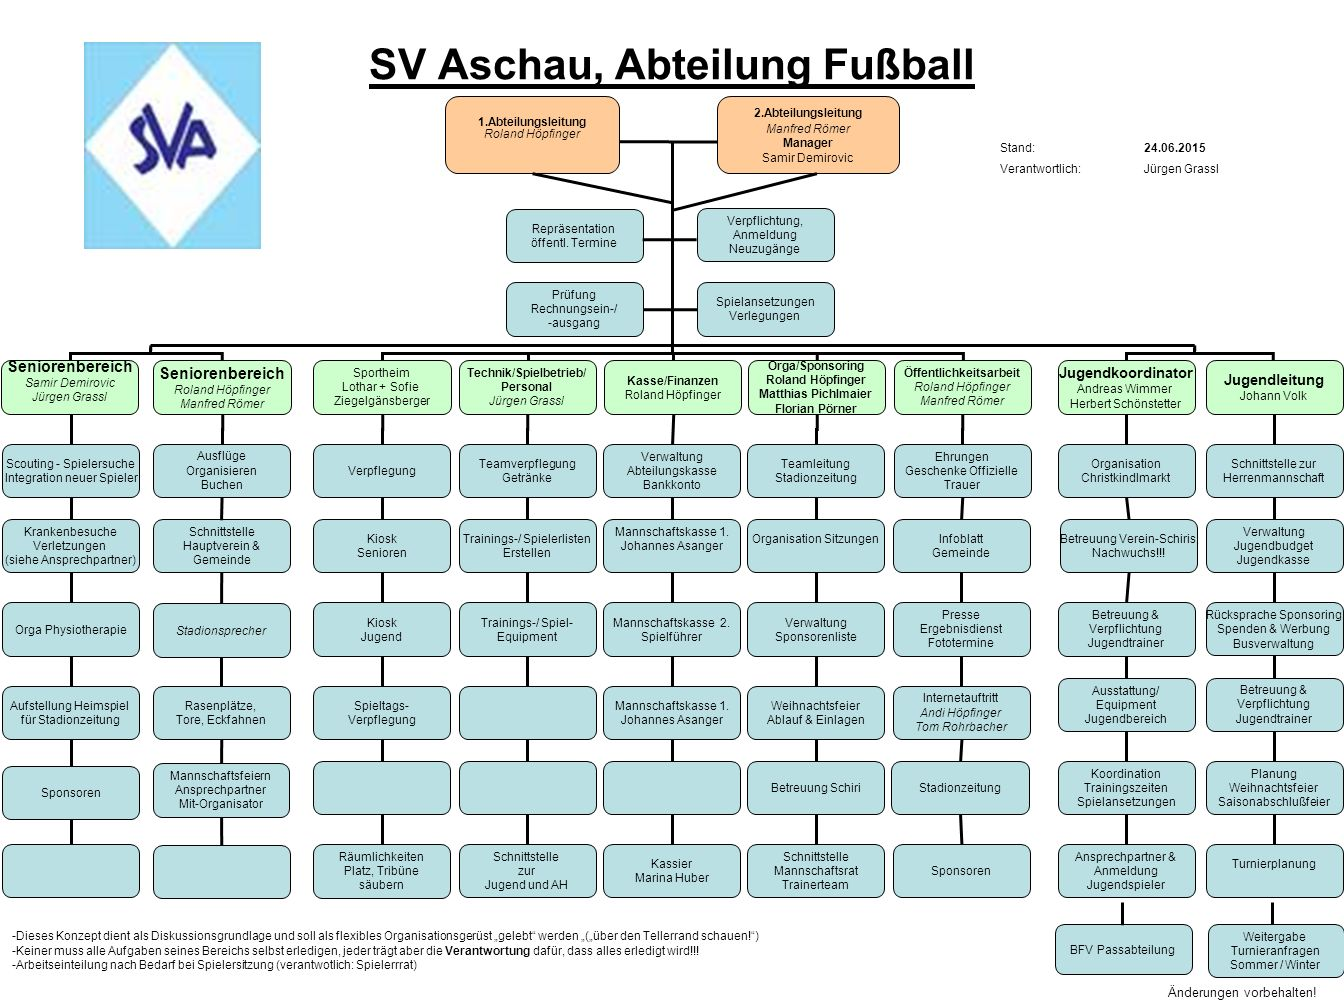 SV Aschau, Abteilung Fußball